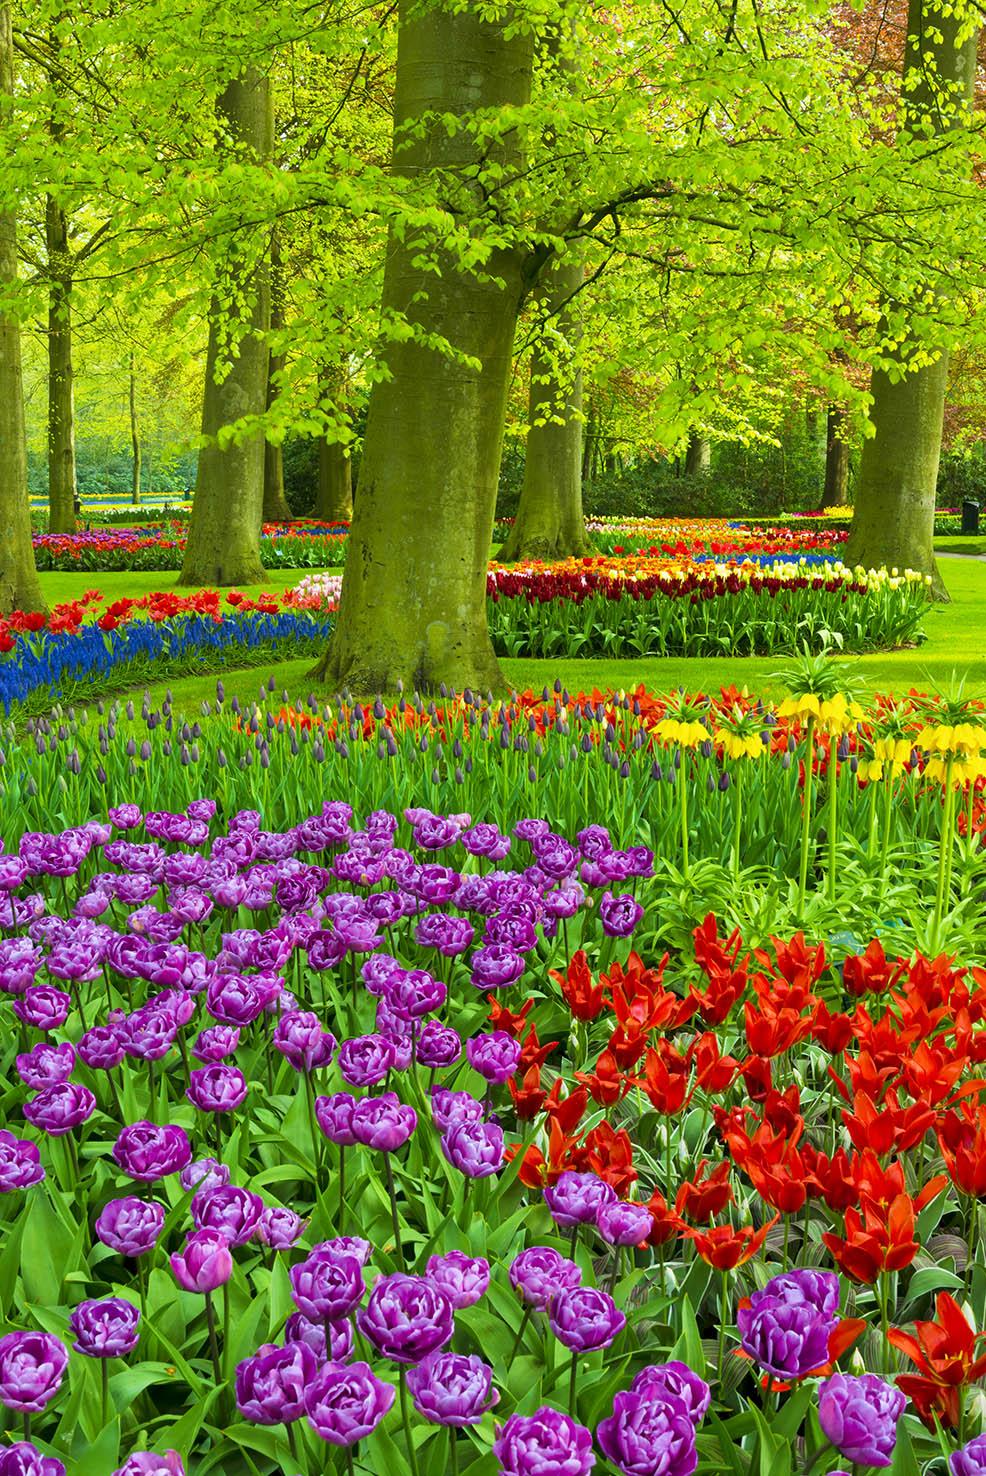 iStock_000025003619_Spring.jpg